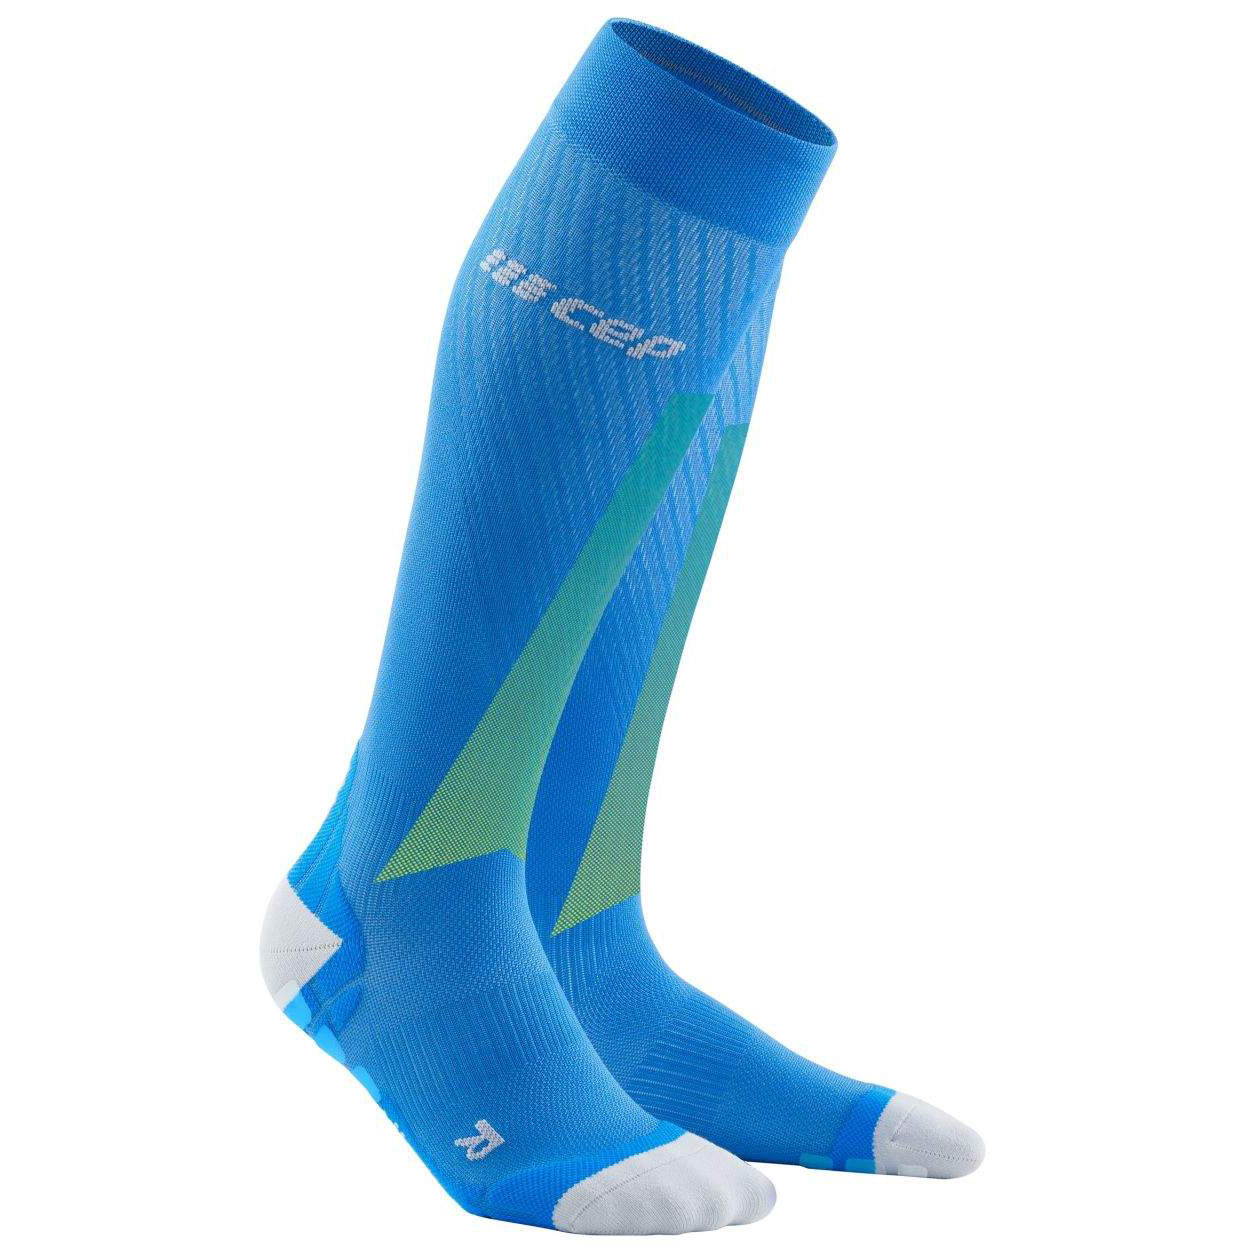 CEP Ultralight Pro Compression Socks - electric blue/light grey